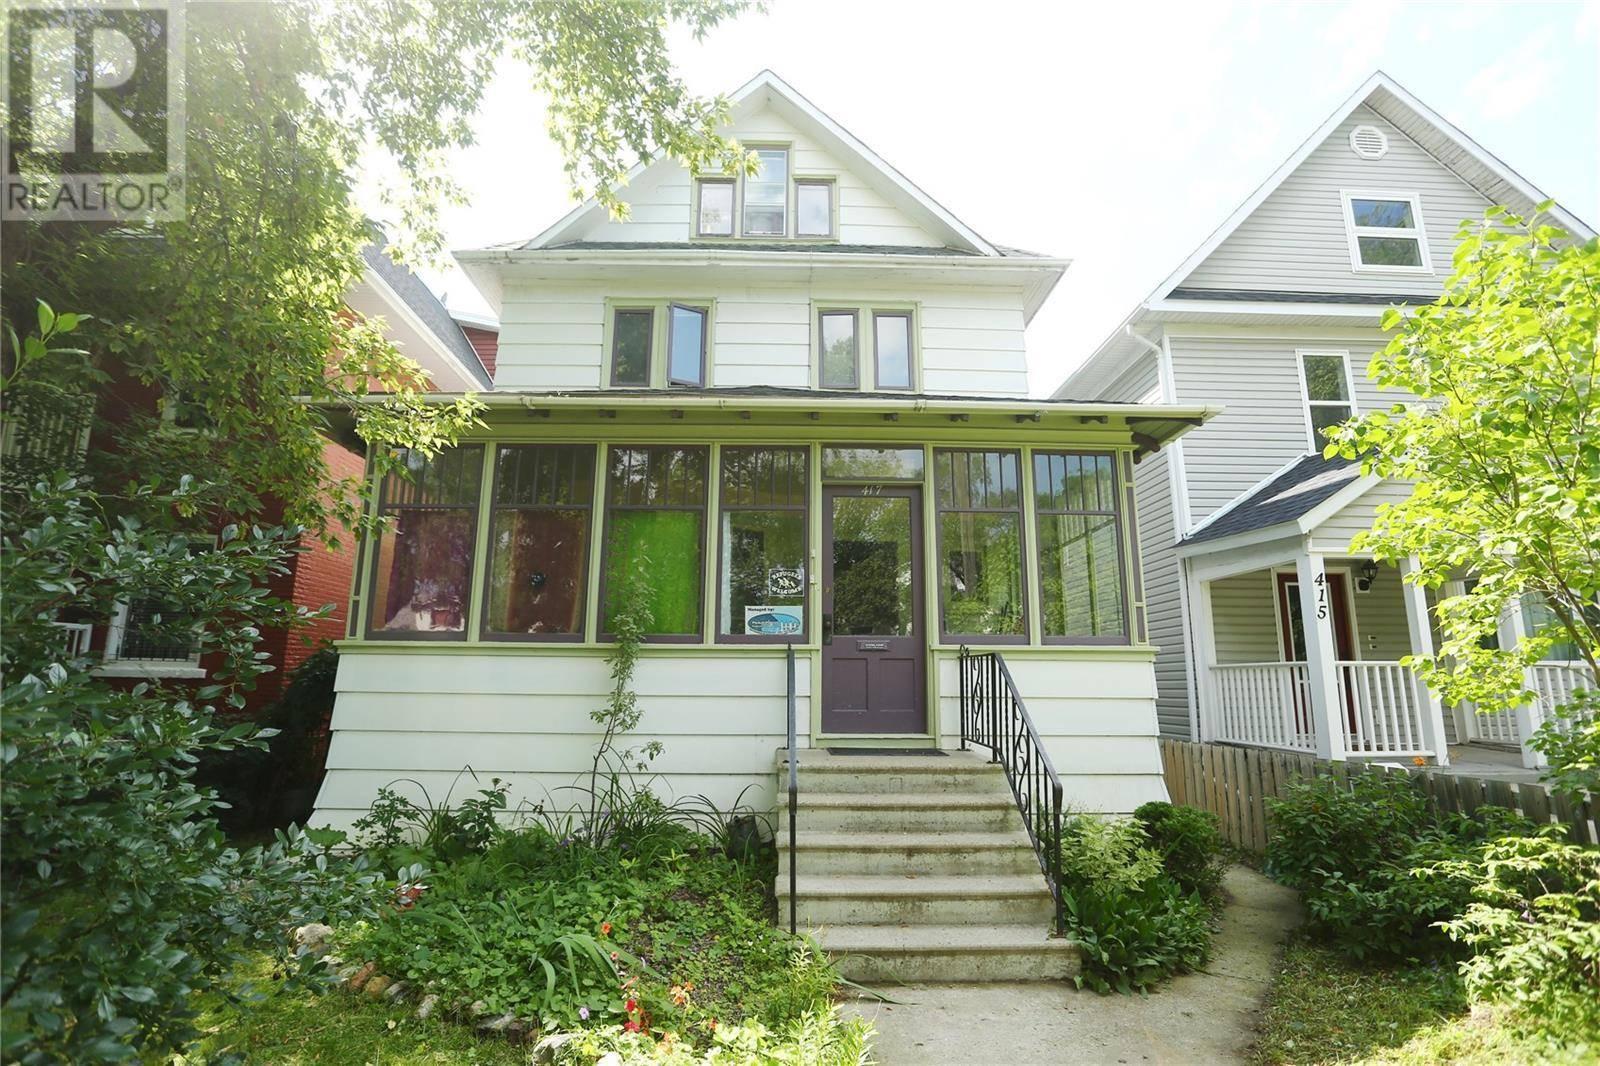 House for sale at 417 H Ave S Saskatoon Saskatchewan - MLS: SK782760